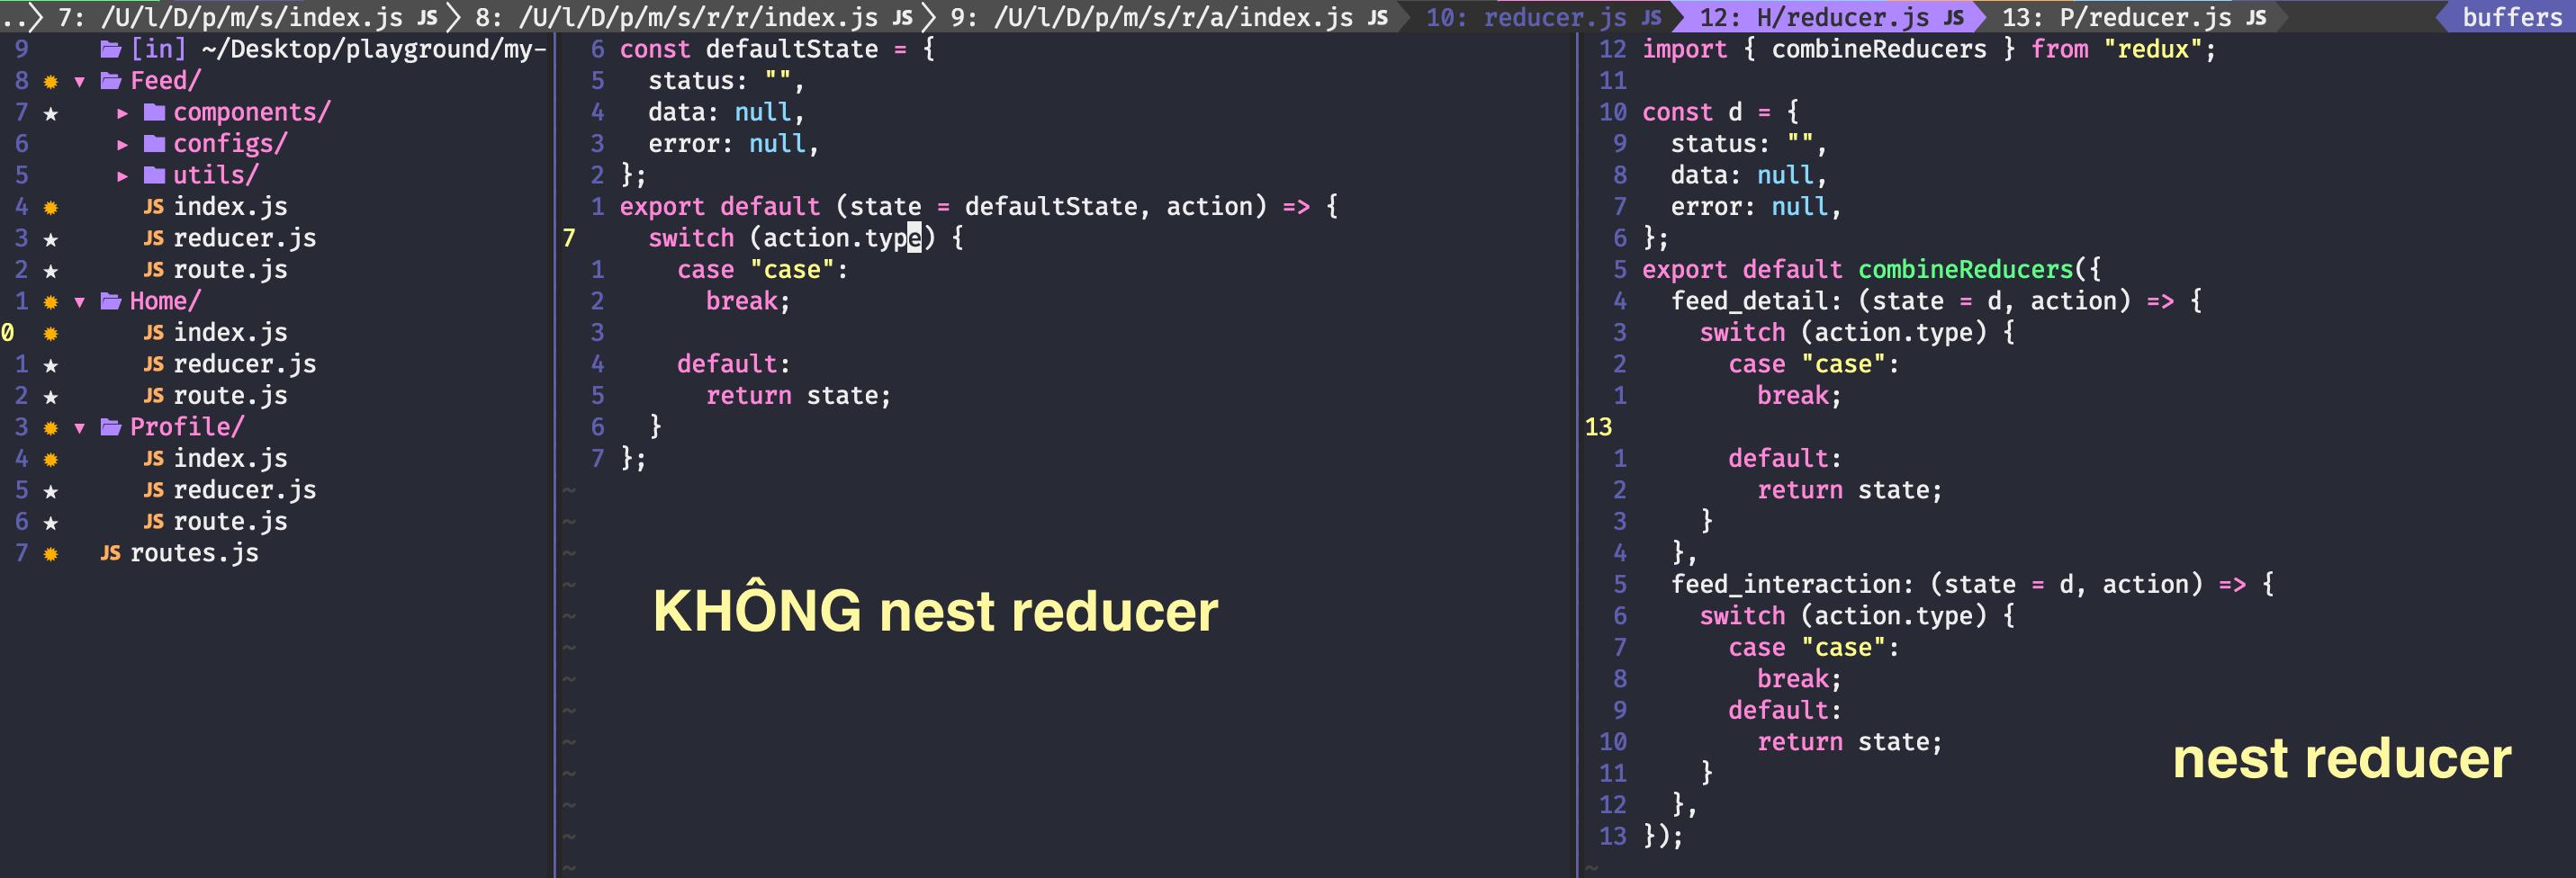 nest reducer